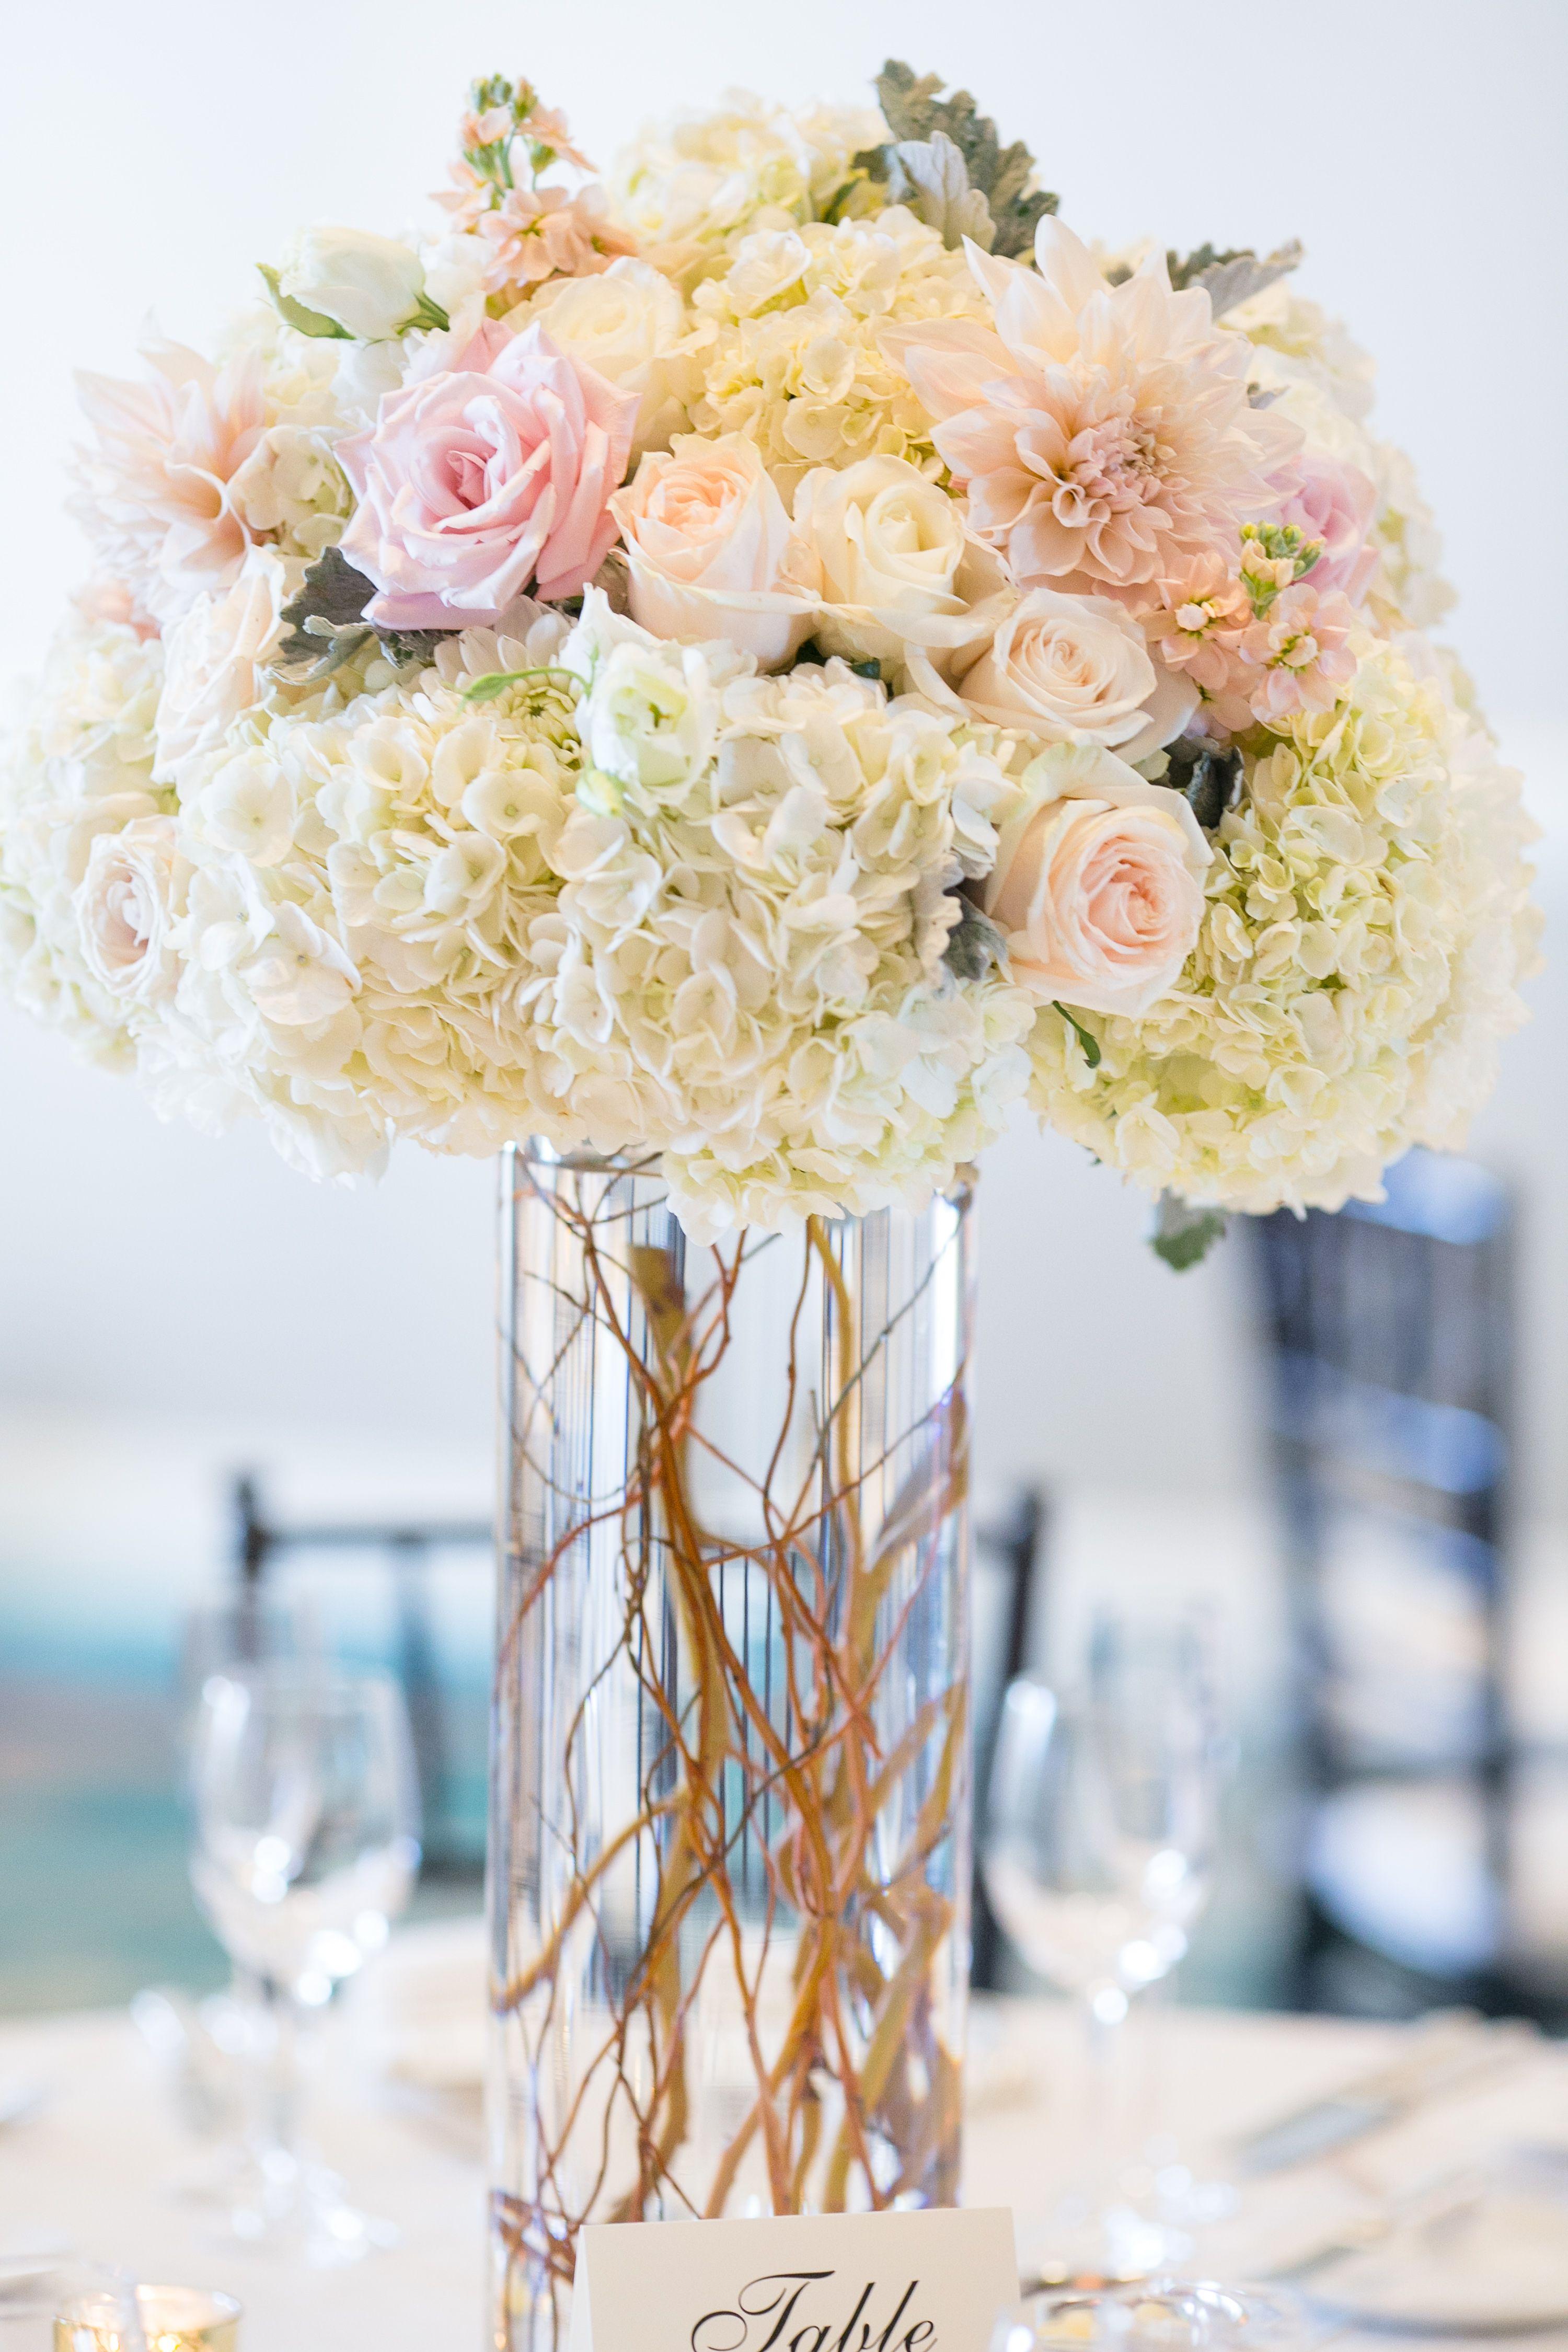 blush and white tall centerpiece. dahlias, hydrangea, curly